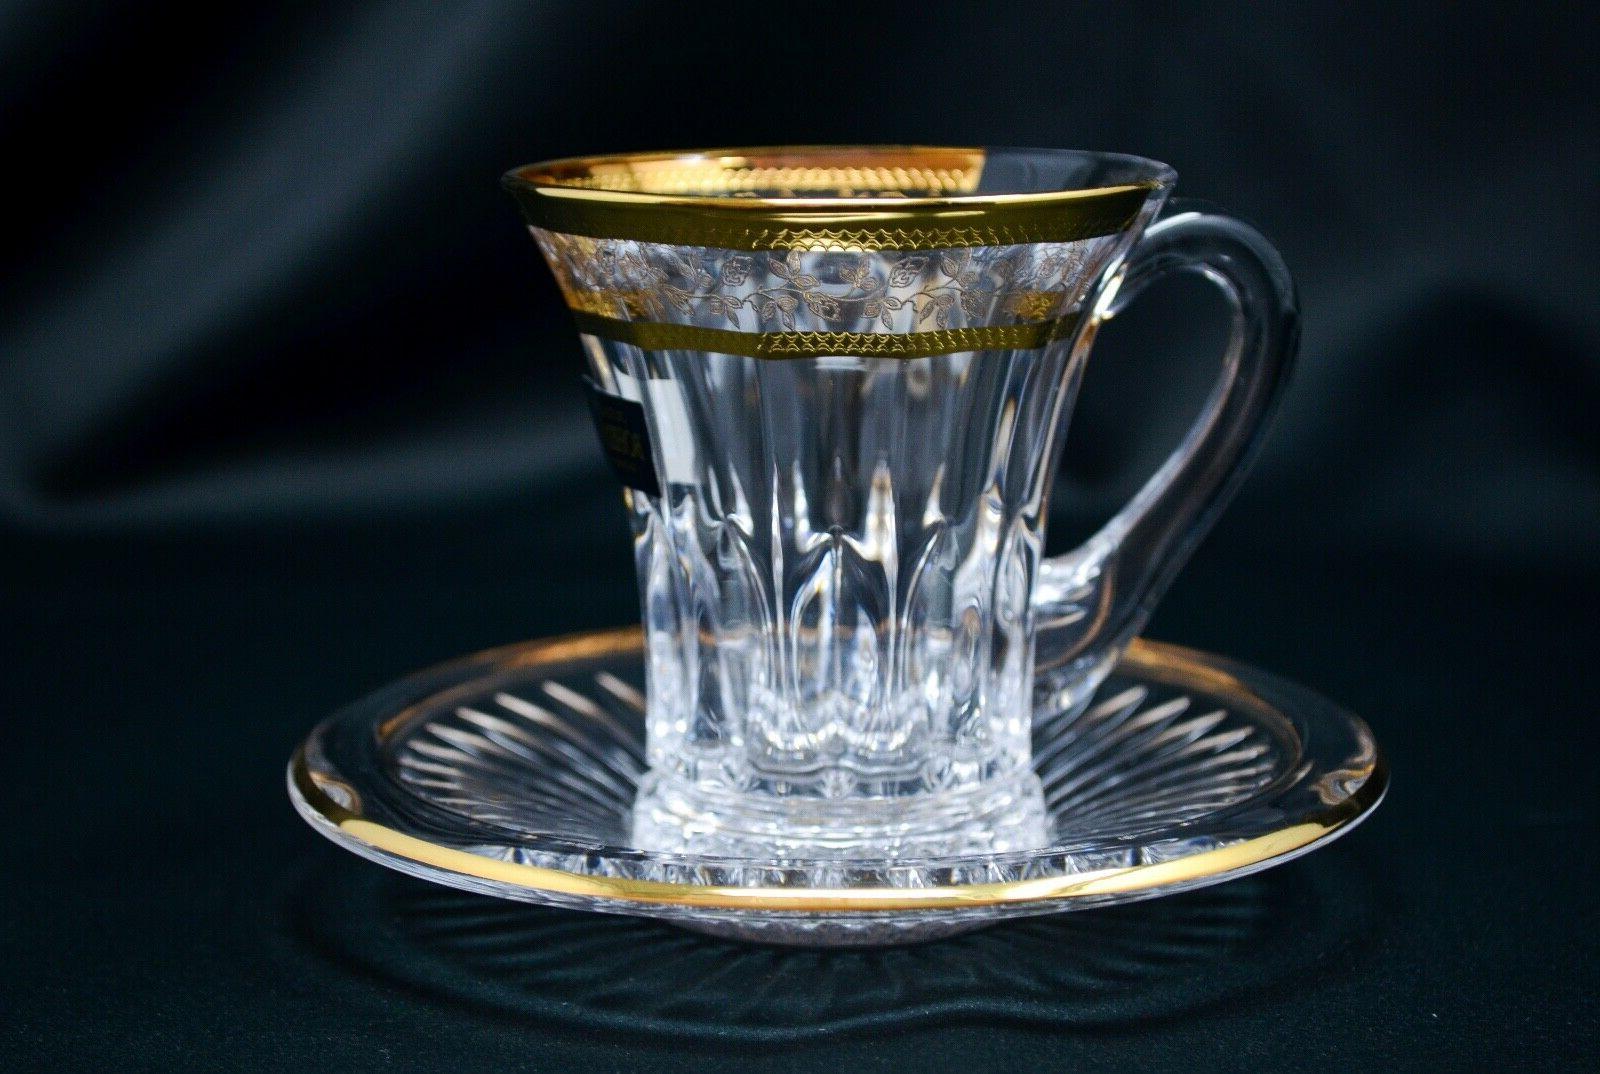 coffee tea set of 1 cup 1